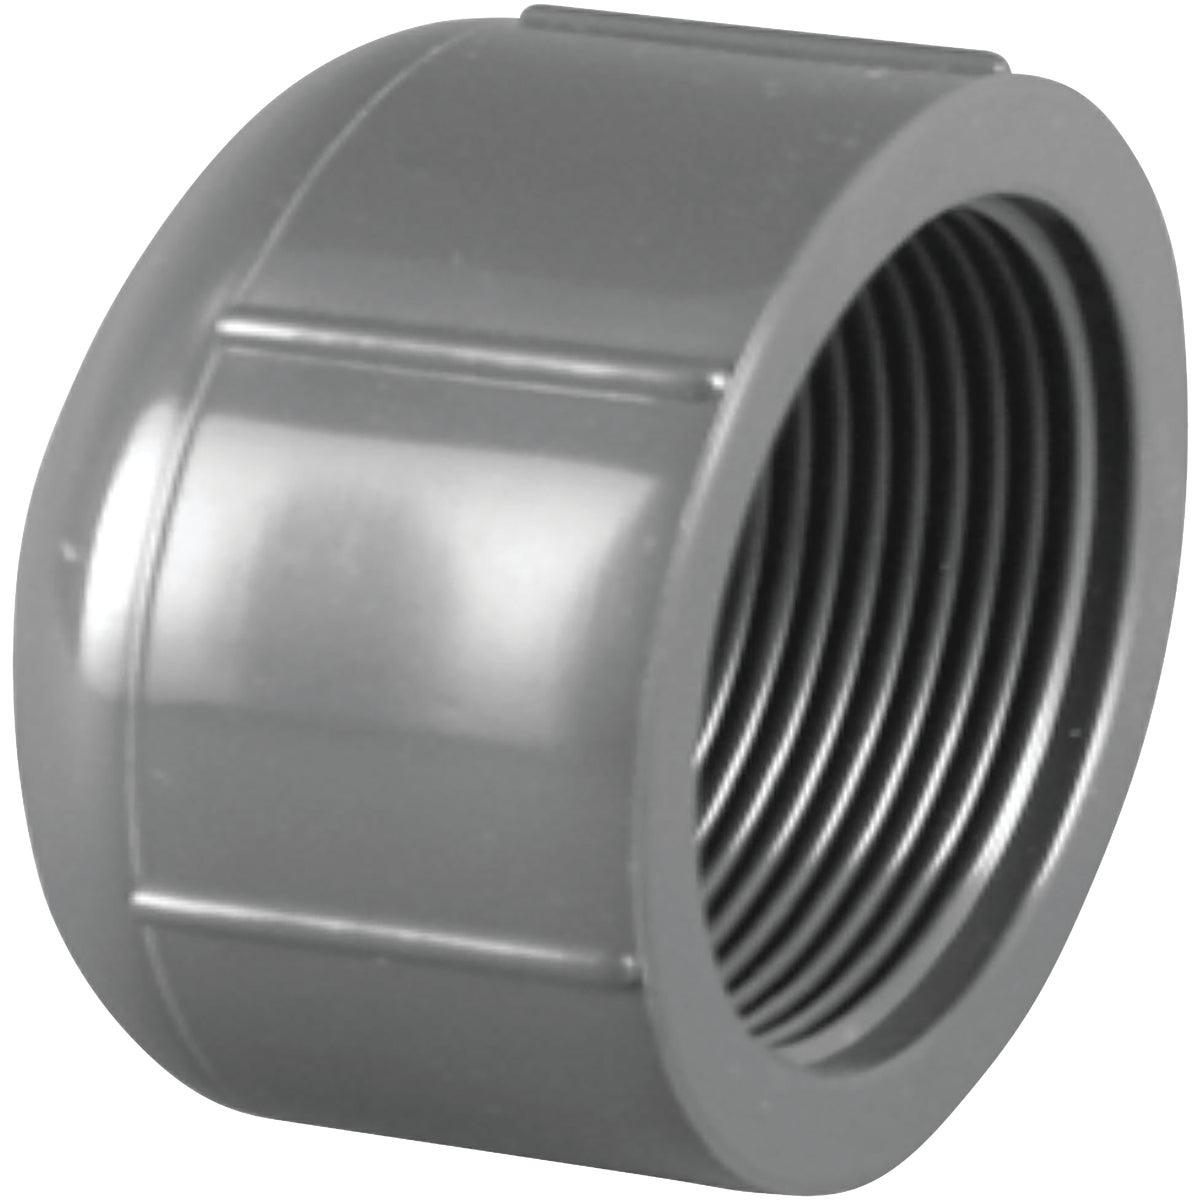 "1/2""FIP SCH80 PVC CAP - 301658 by Genova Inc"